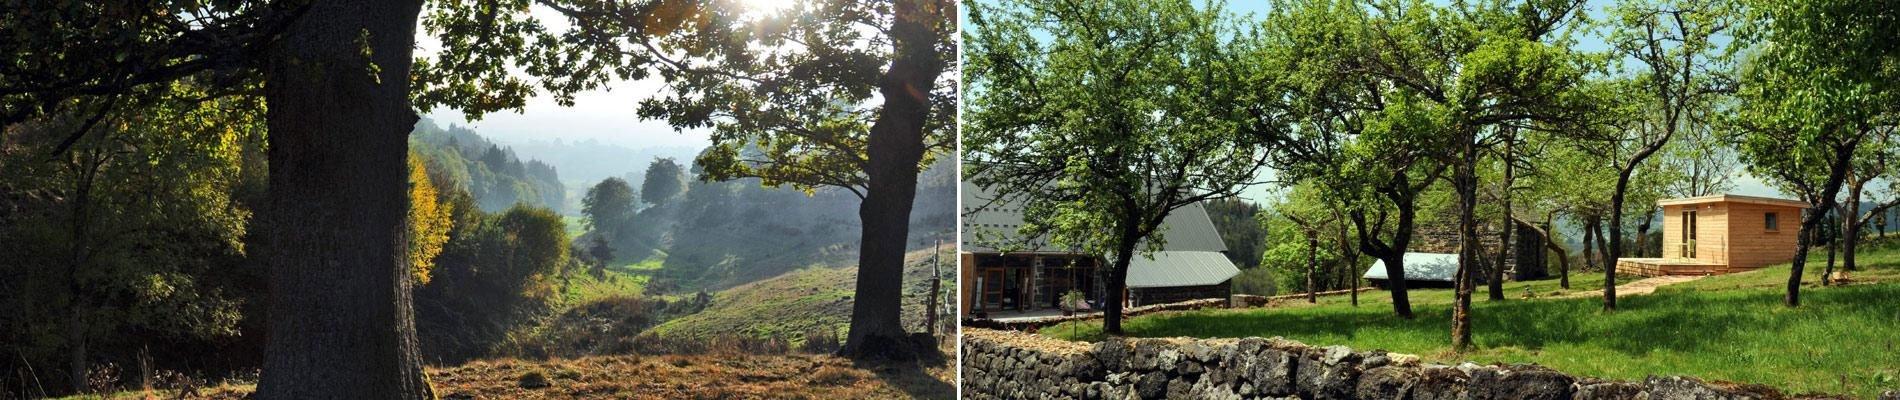 volcalodges-auvergne-zomers-frankrijk